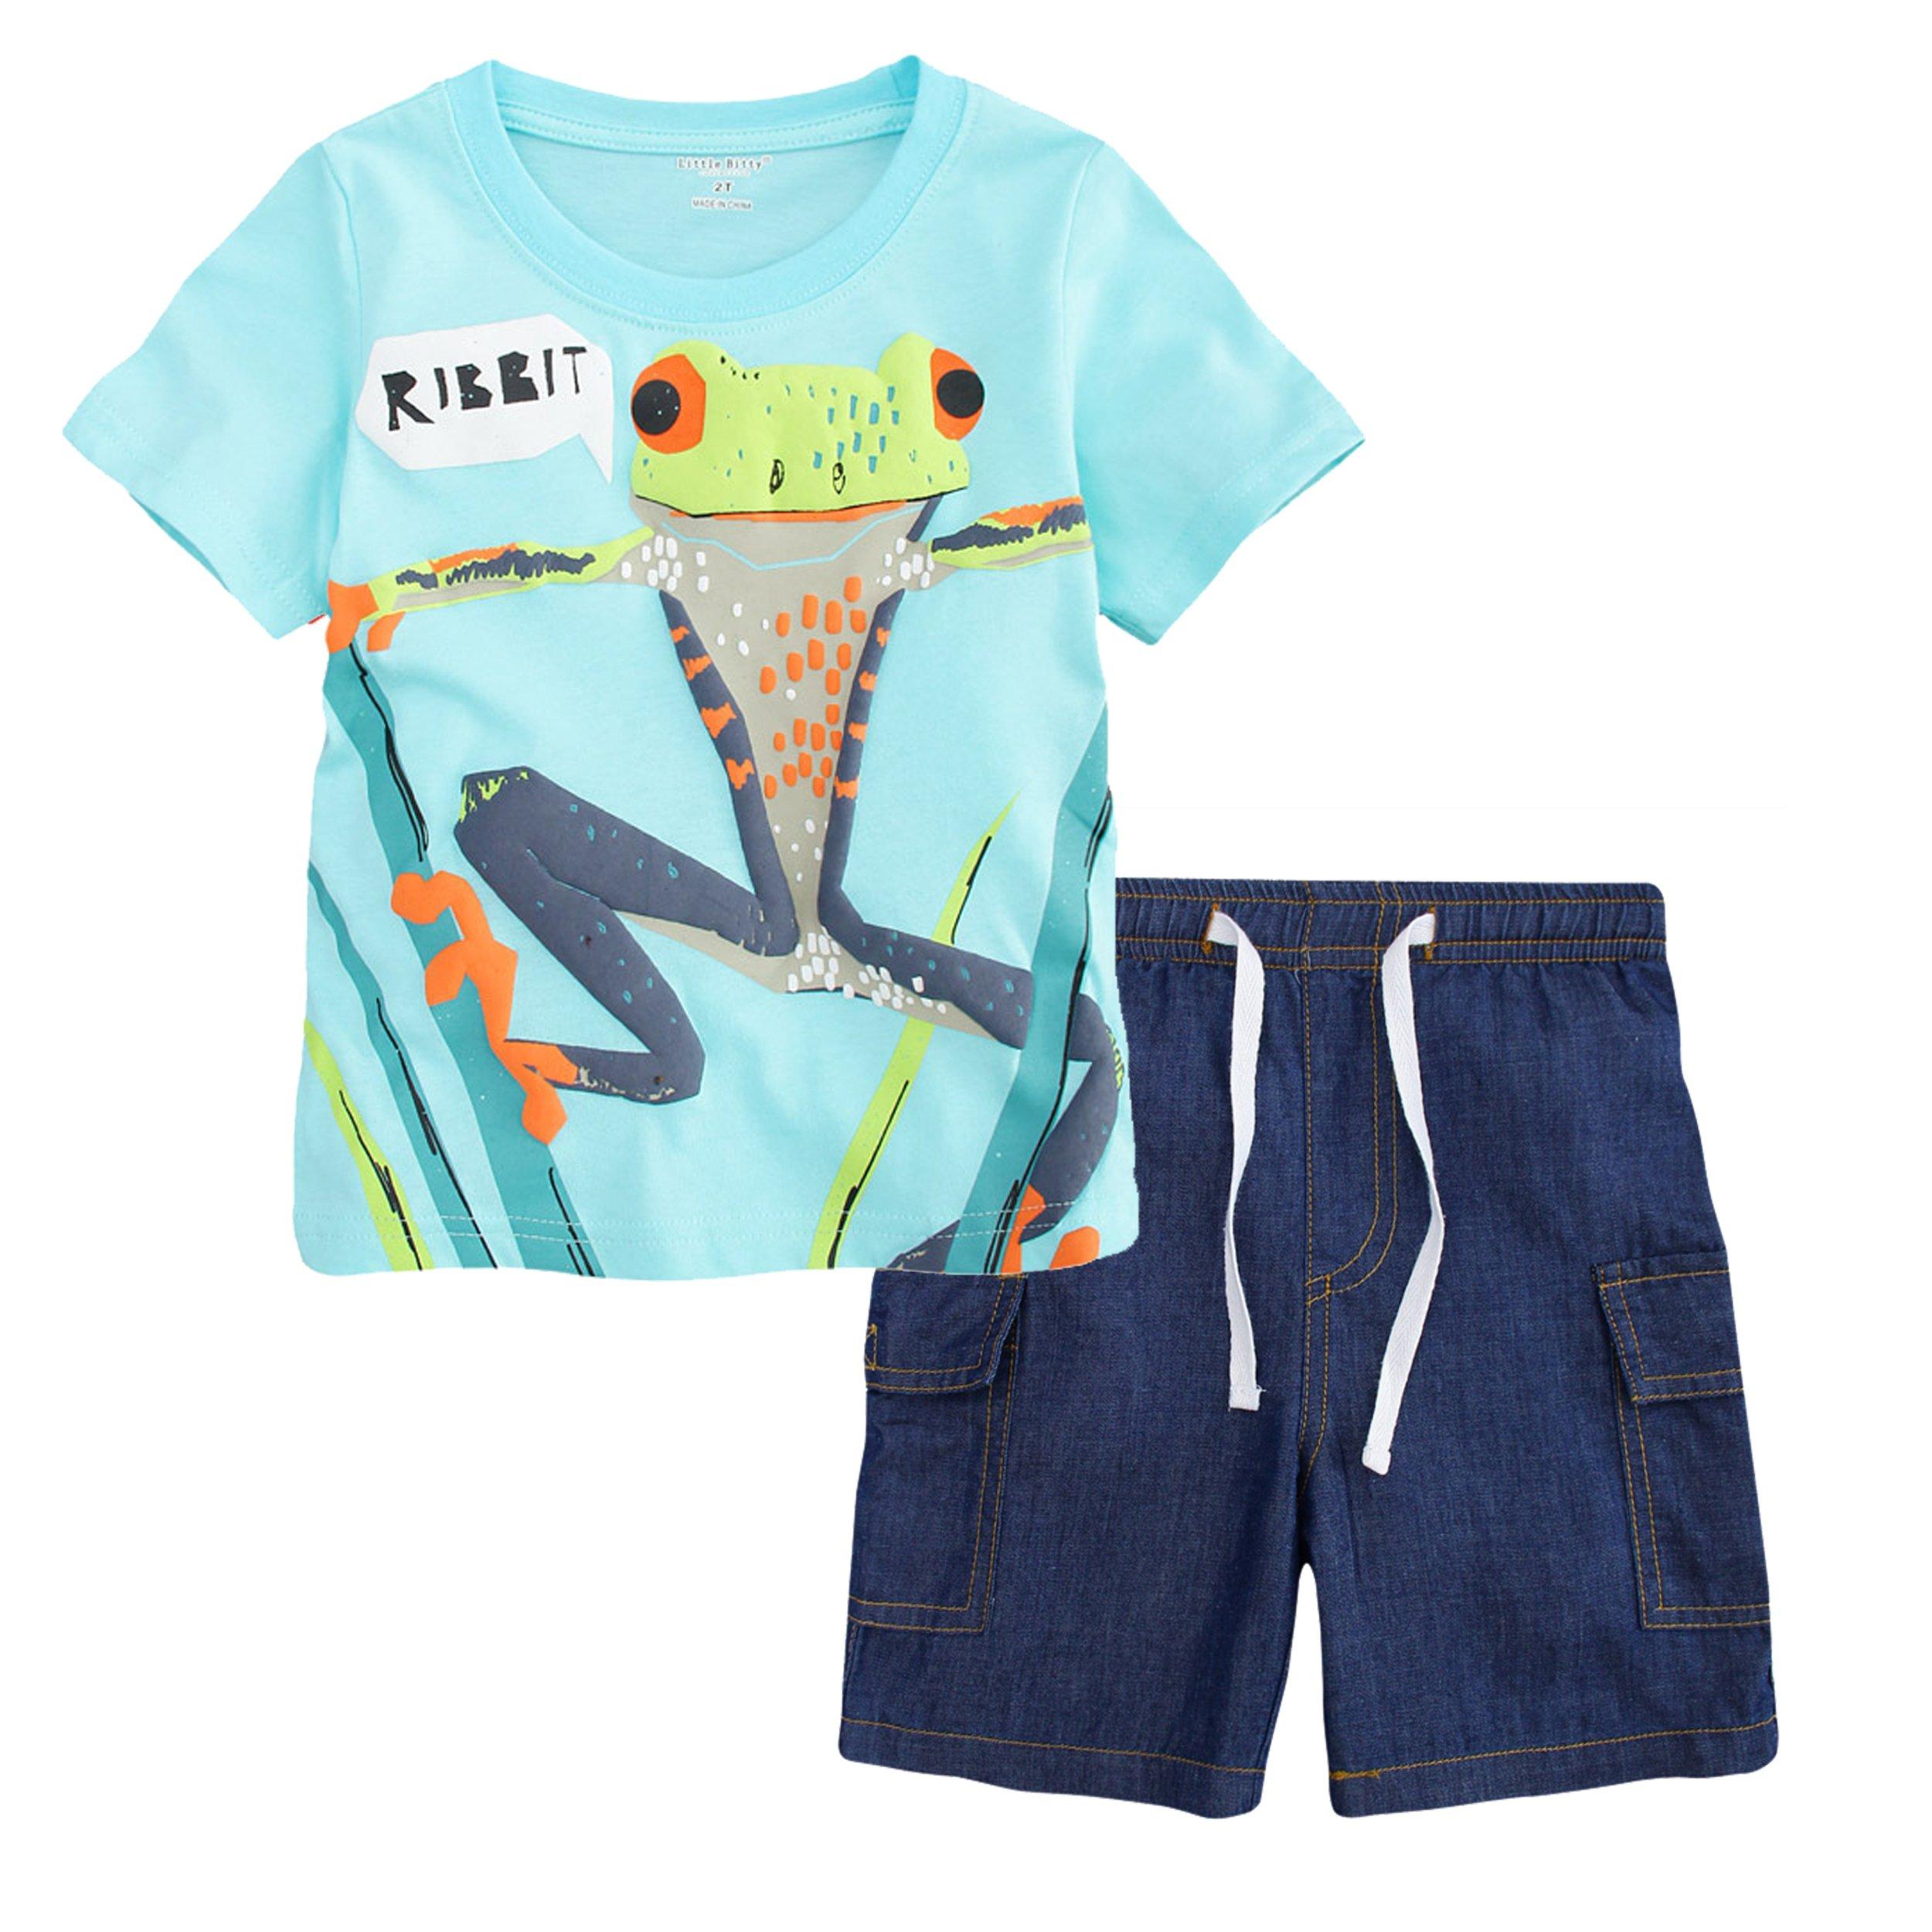 Little Bitty Little Boy Short Set Summer Cotton Clothing Set Shorts Set Blue 4T